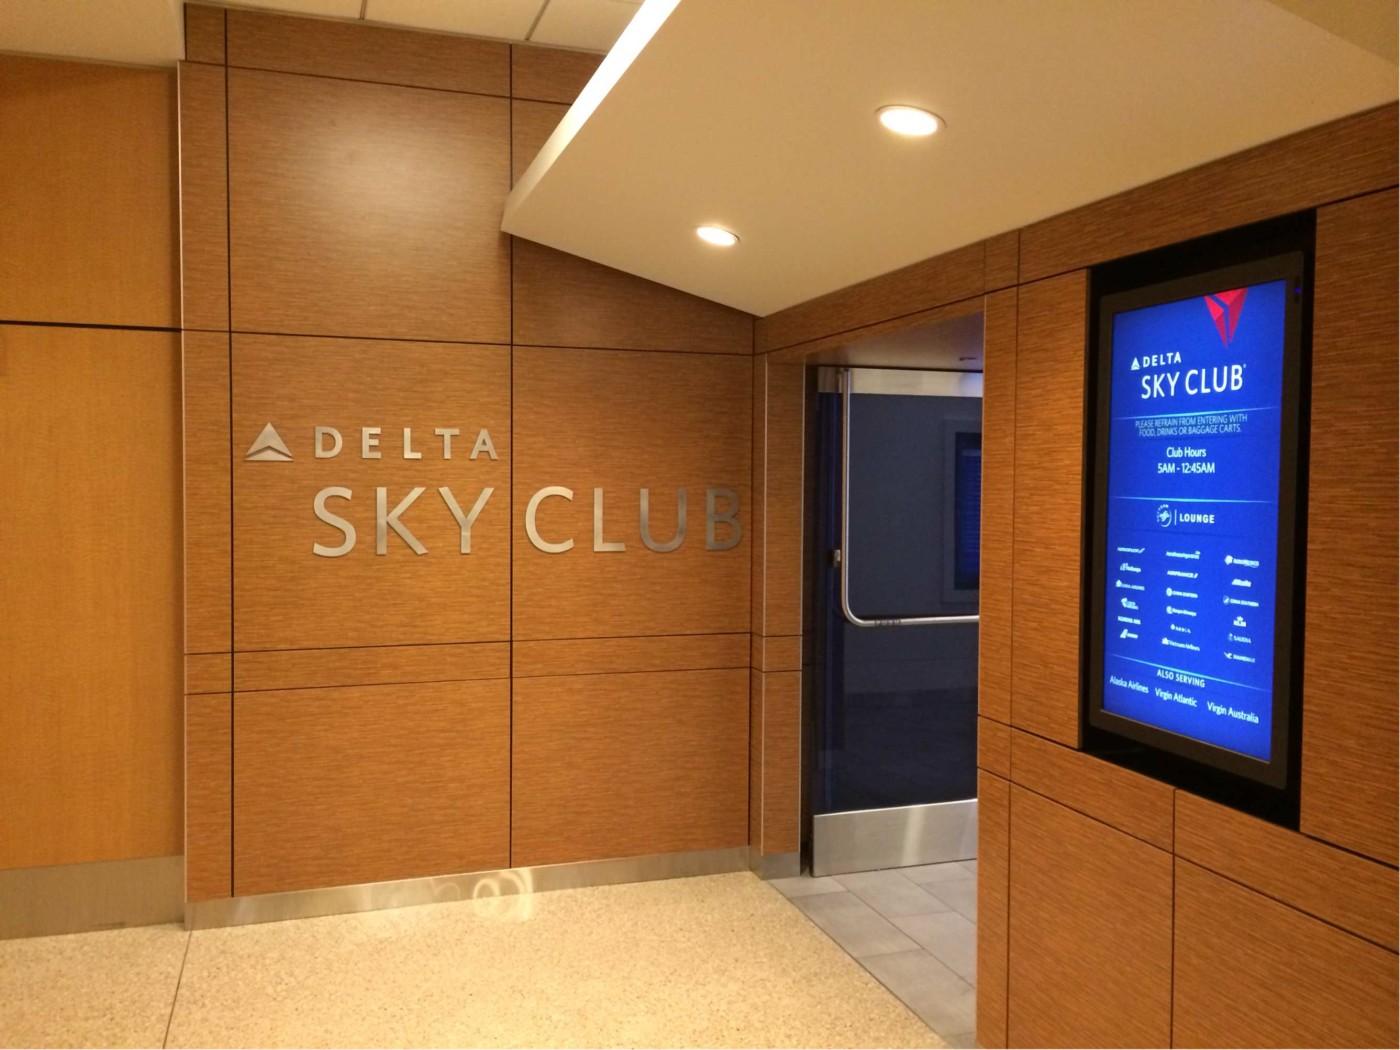 Delta Sky Club – Fort Lauderdale International Airport 4